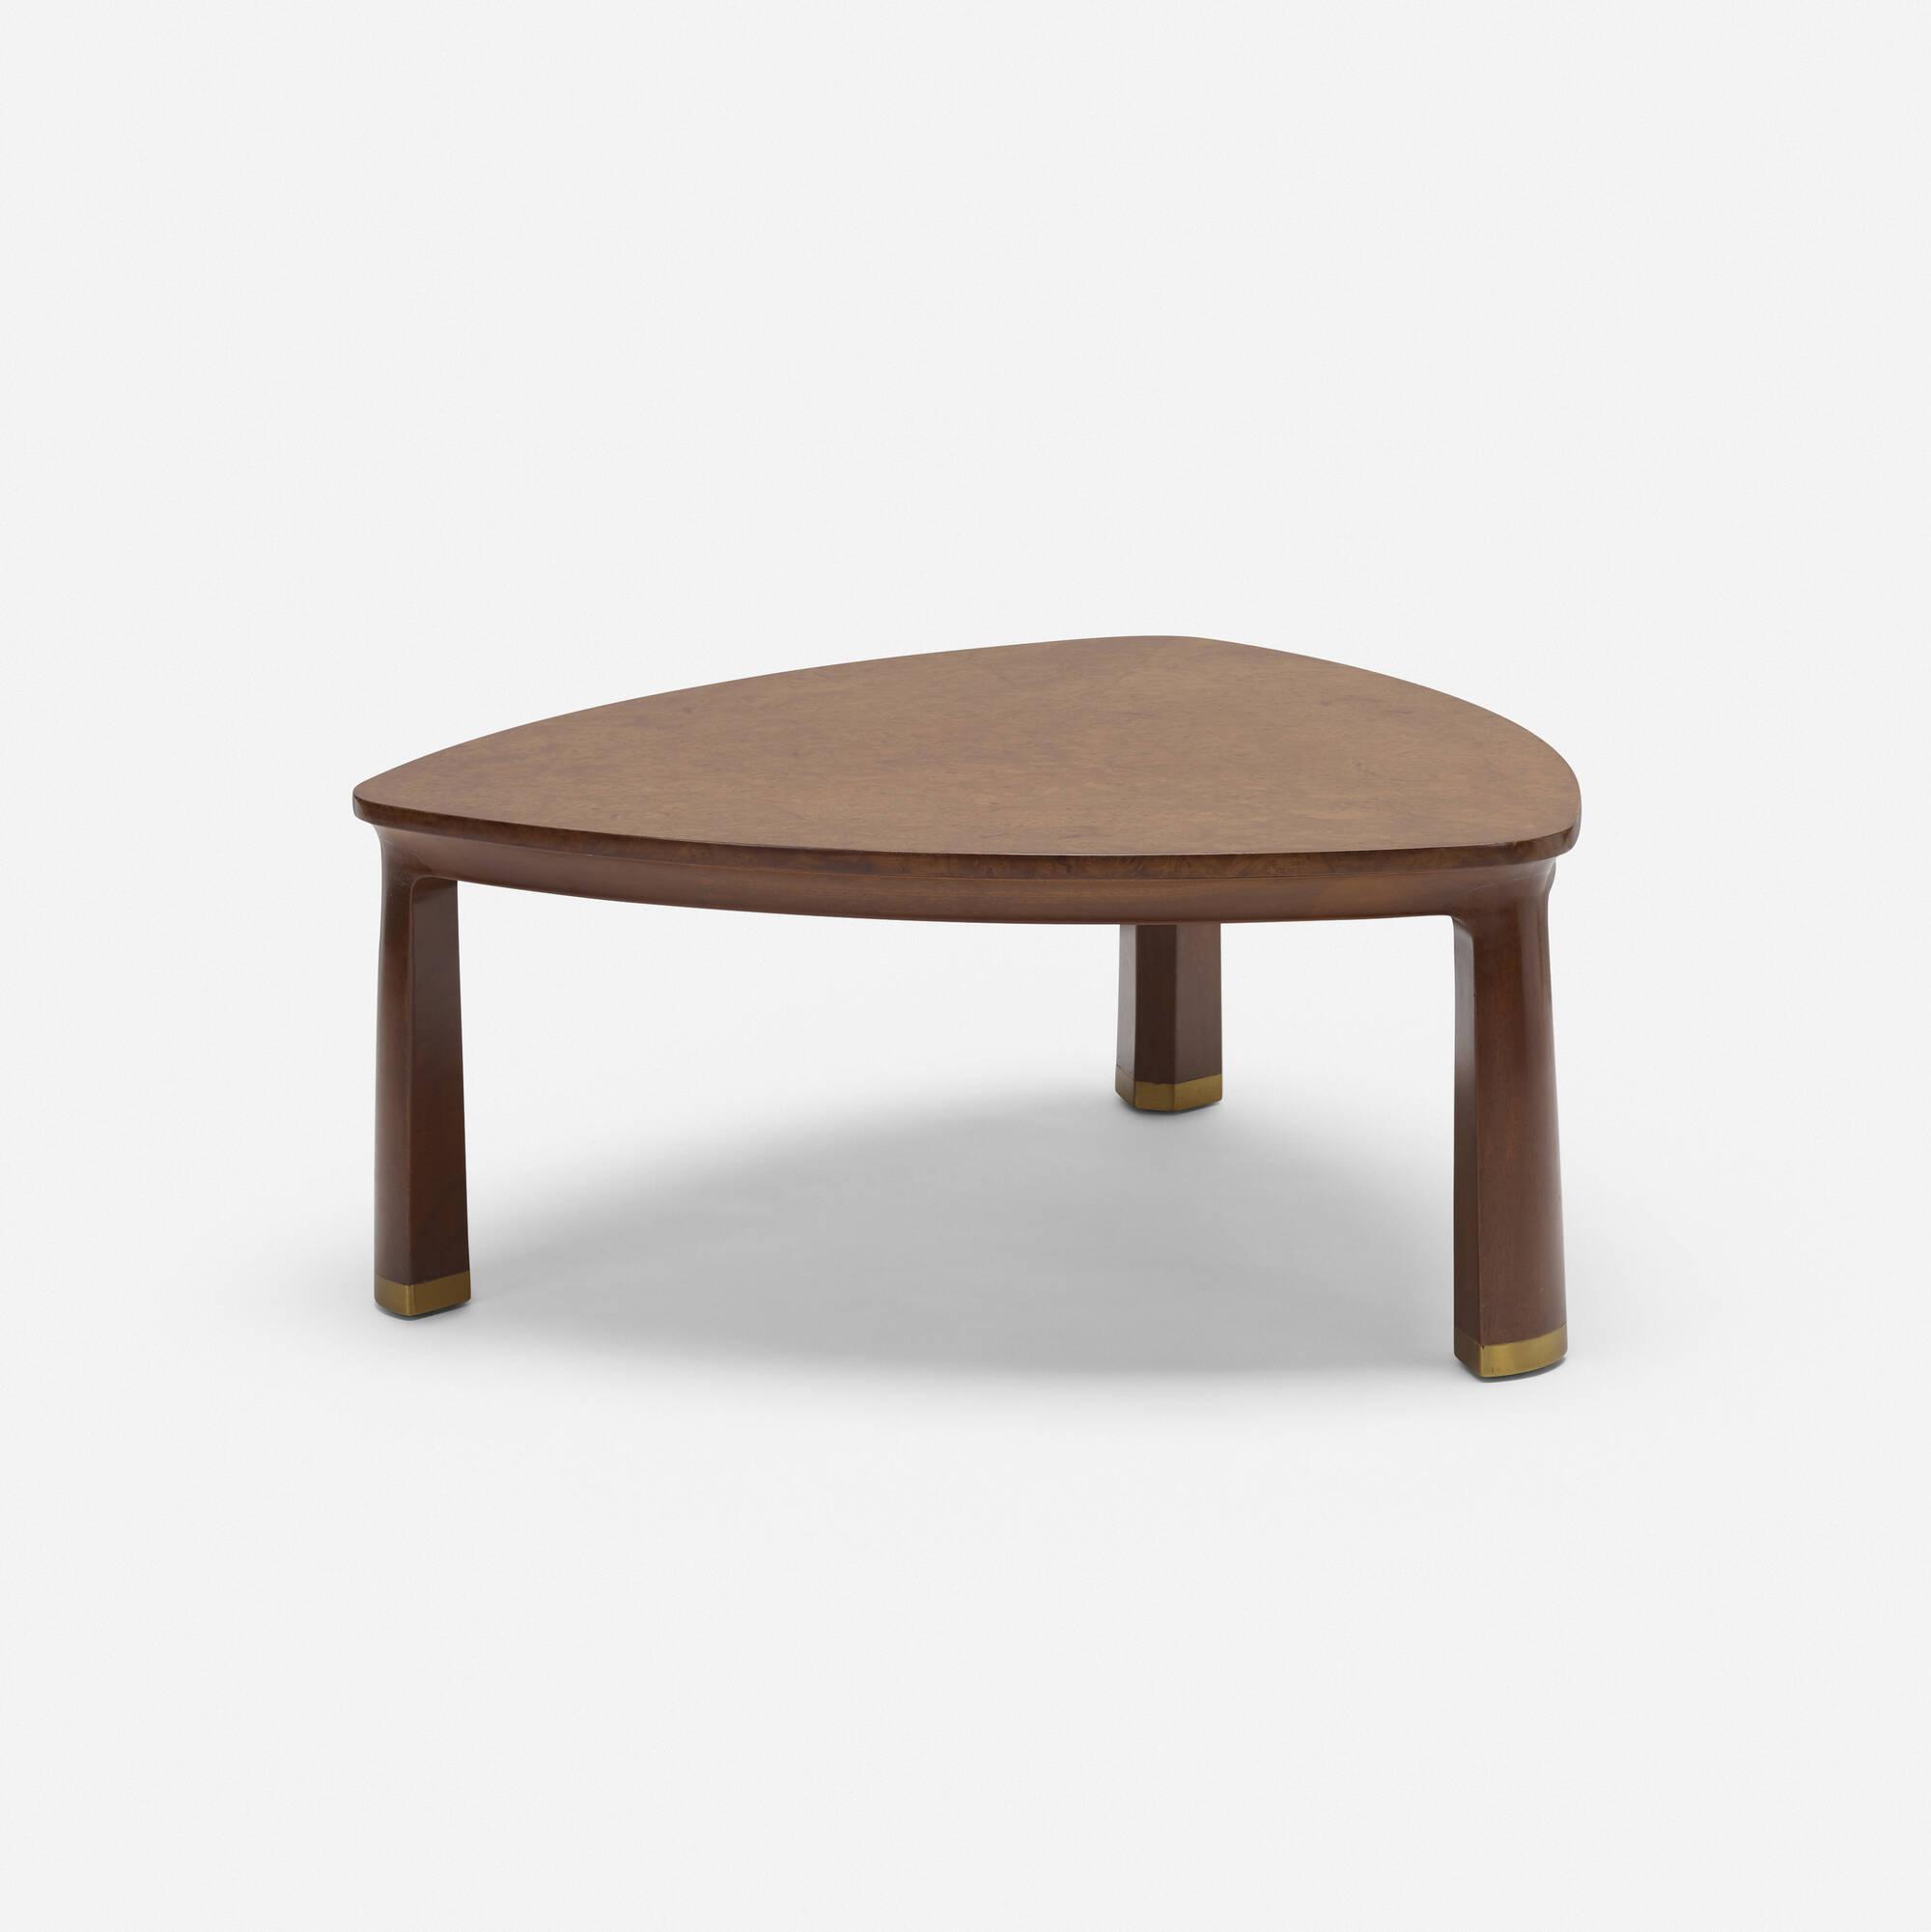 805: Edward Wormley / coffee table, model 6029 (1 of 2)